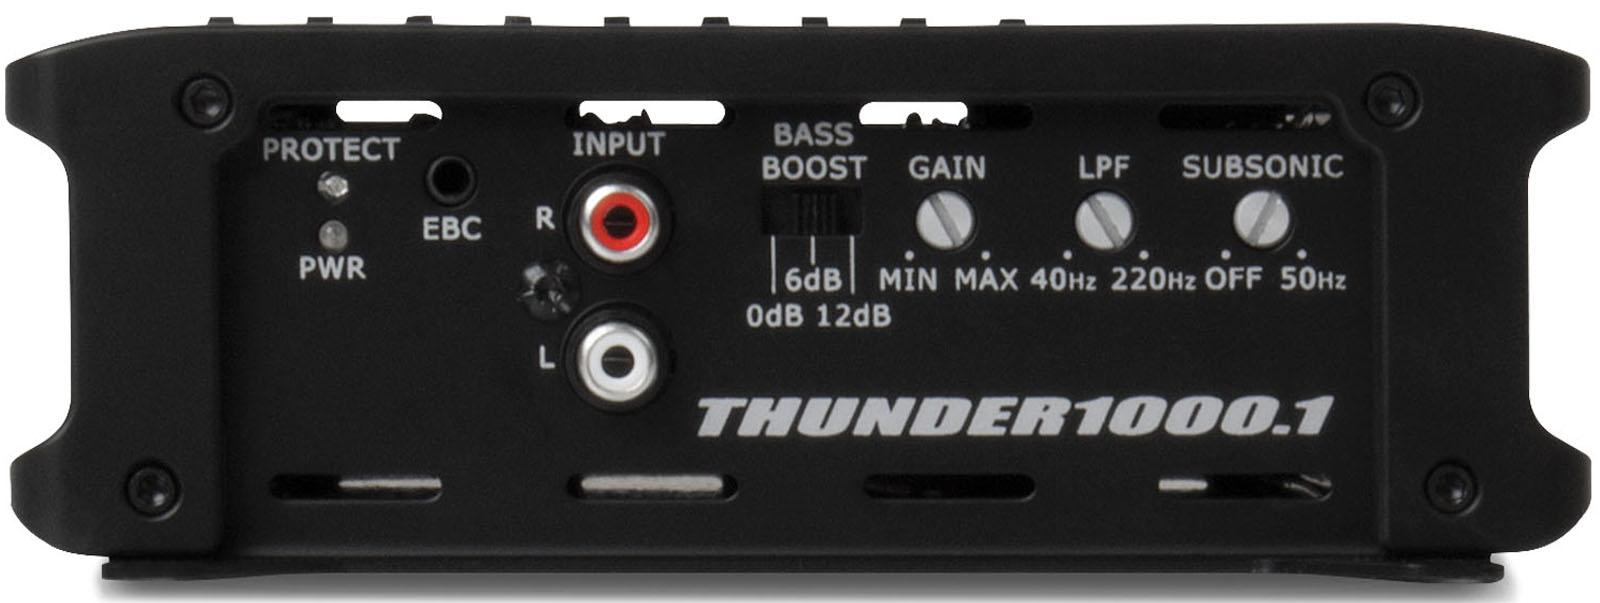 Thunder1000 1 Thunder Series 1000 Watt Class D Mono Block